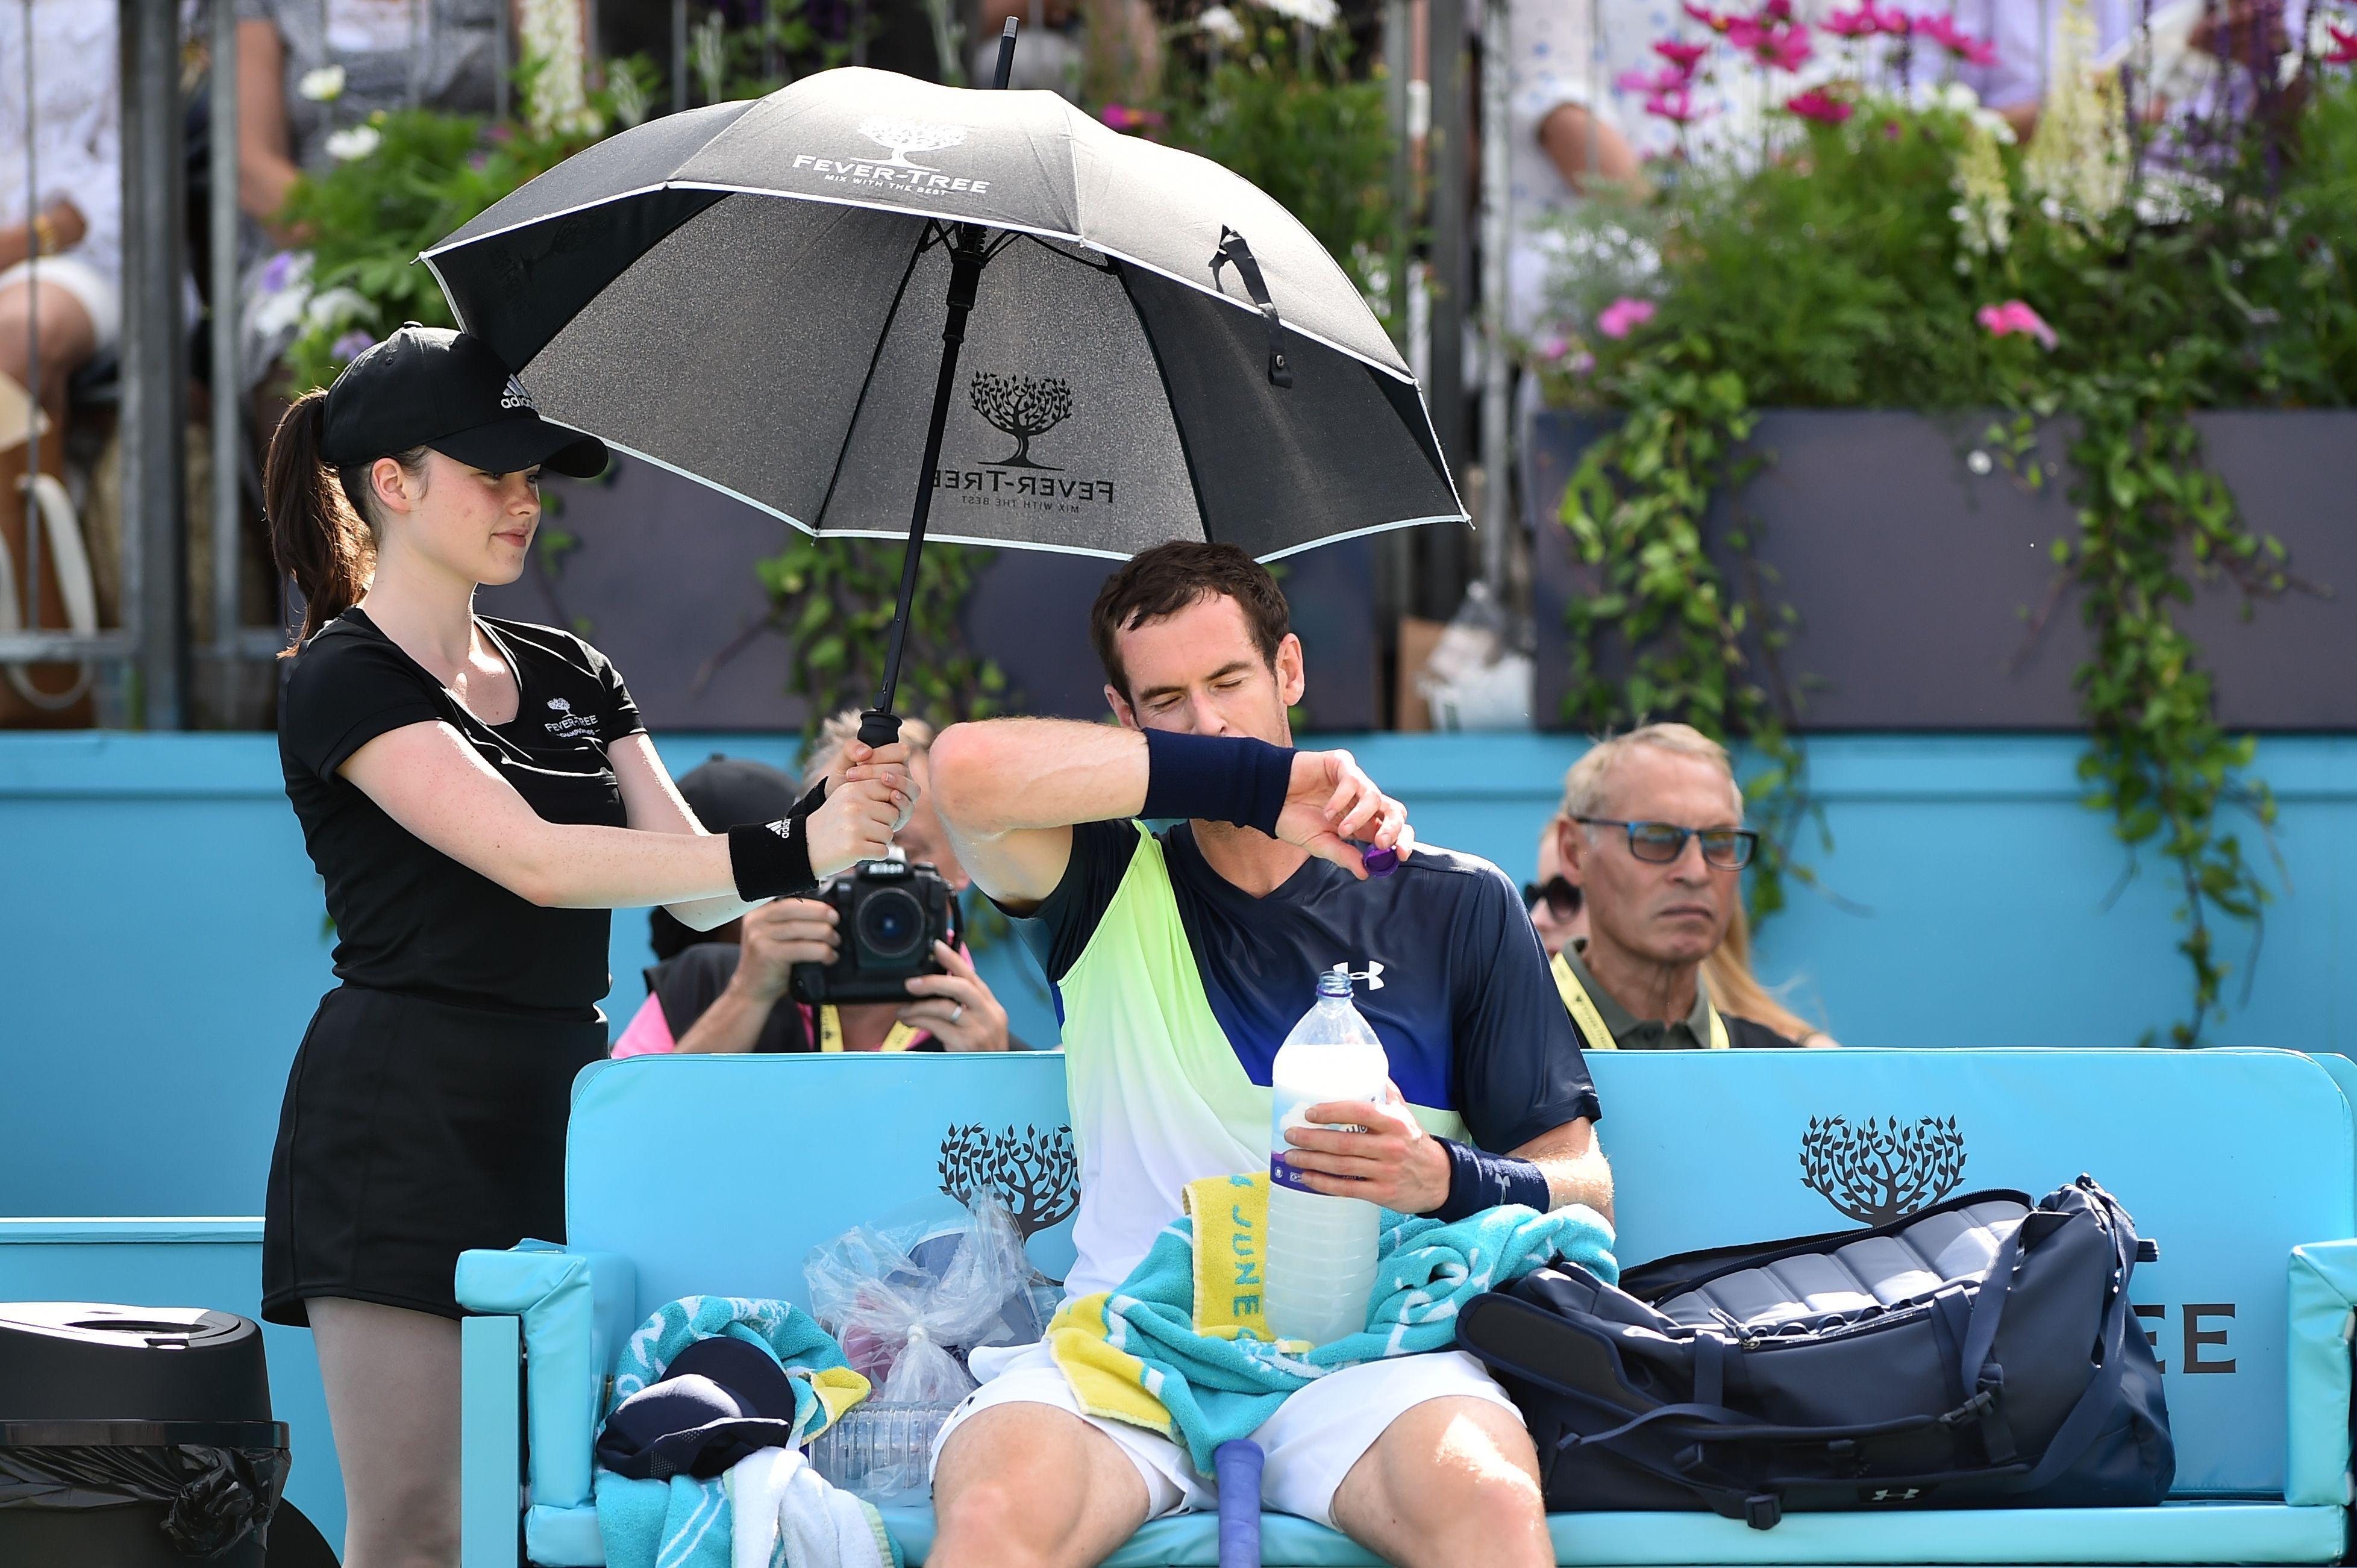 Murray lost on his tennis return against Australian star Kyrgios